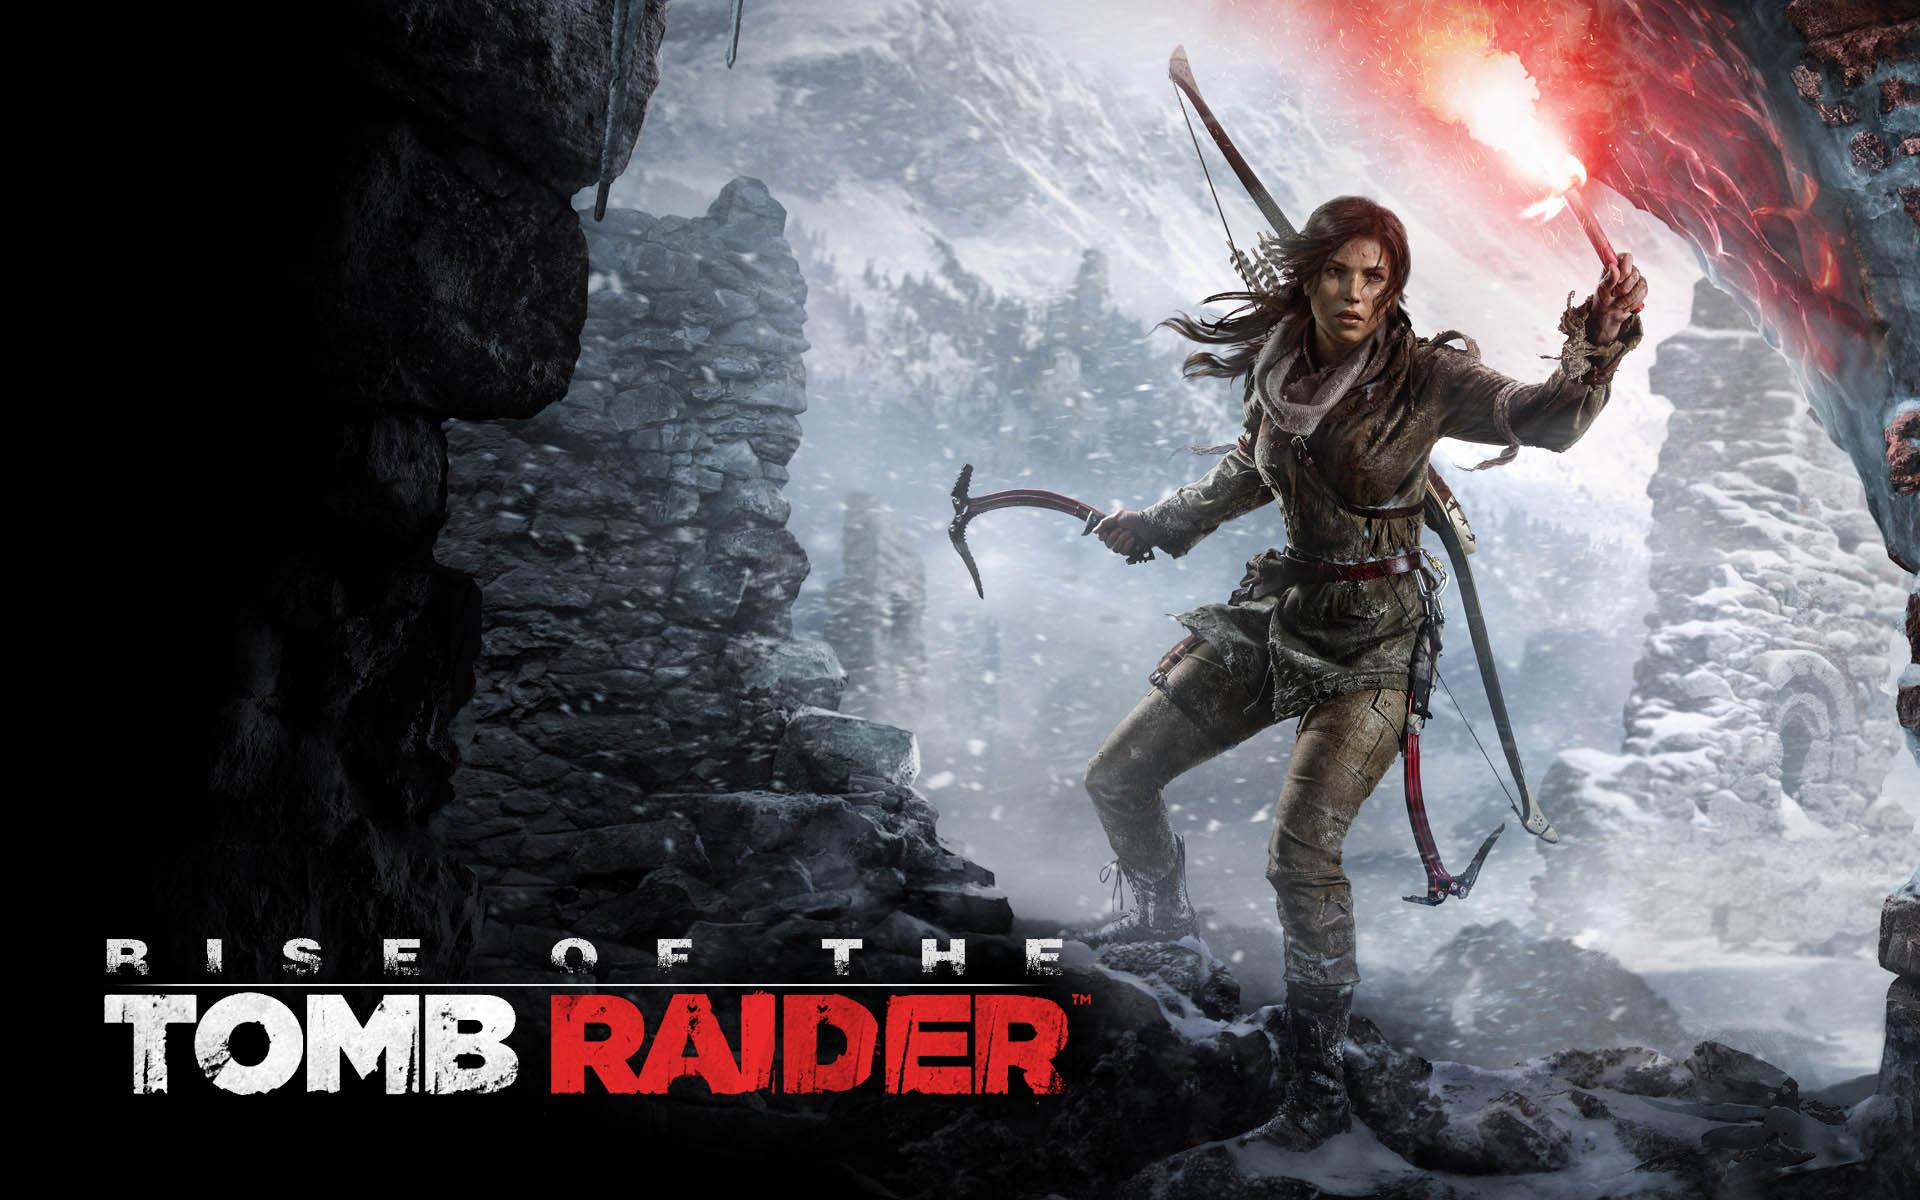 rise_of_the_tomb_raider_648064588.jpg